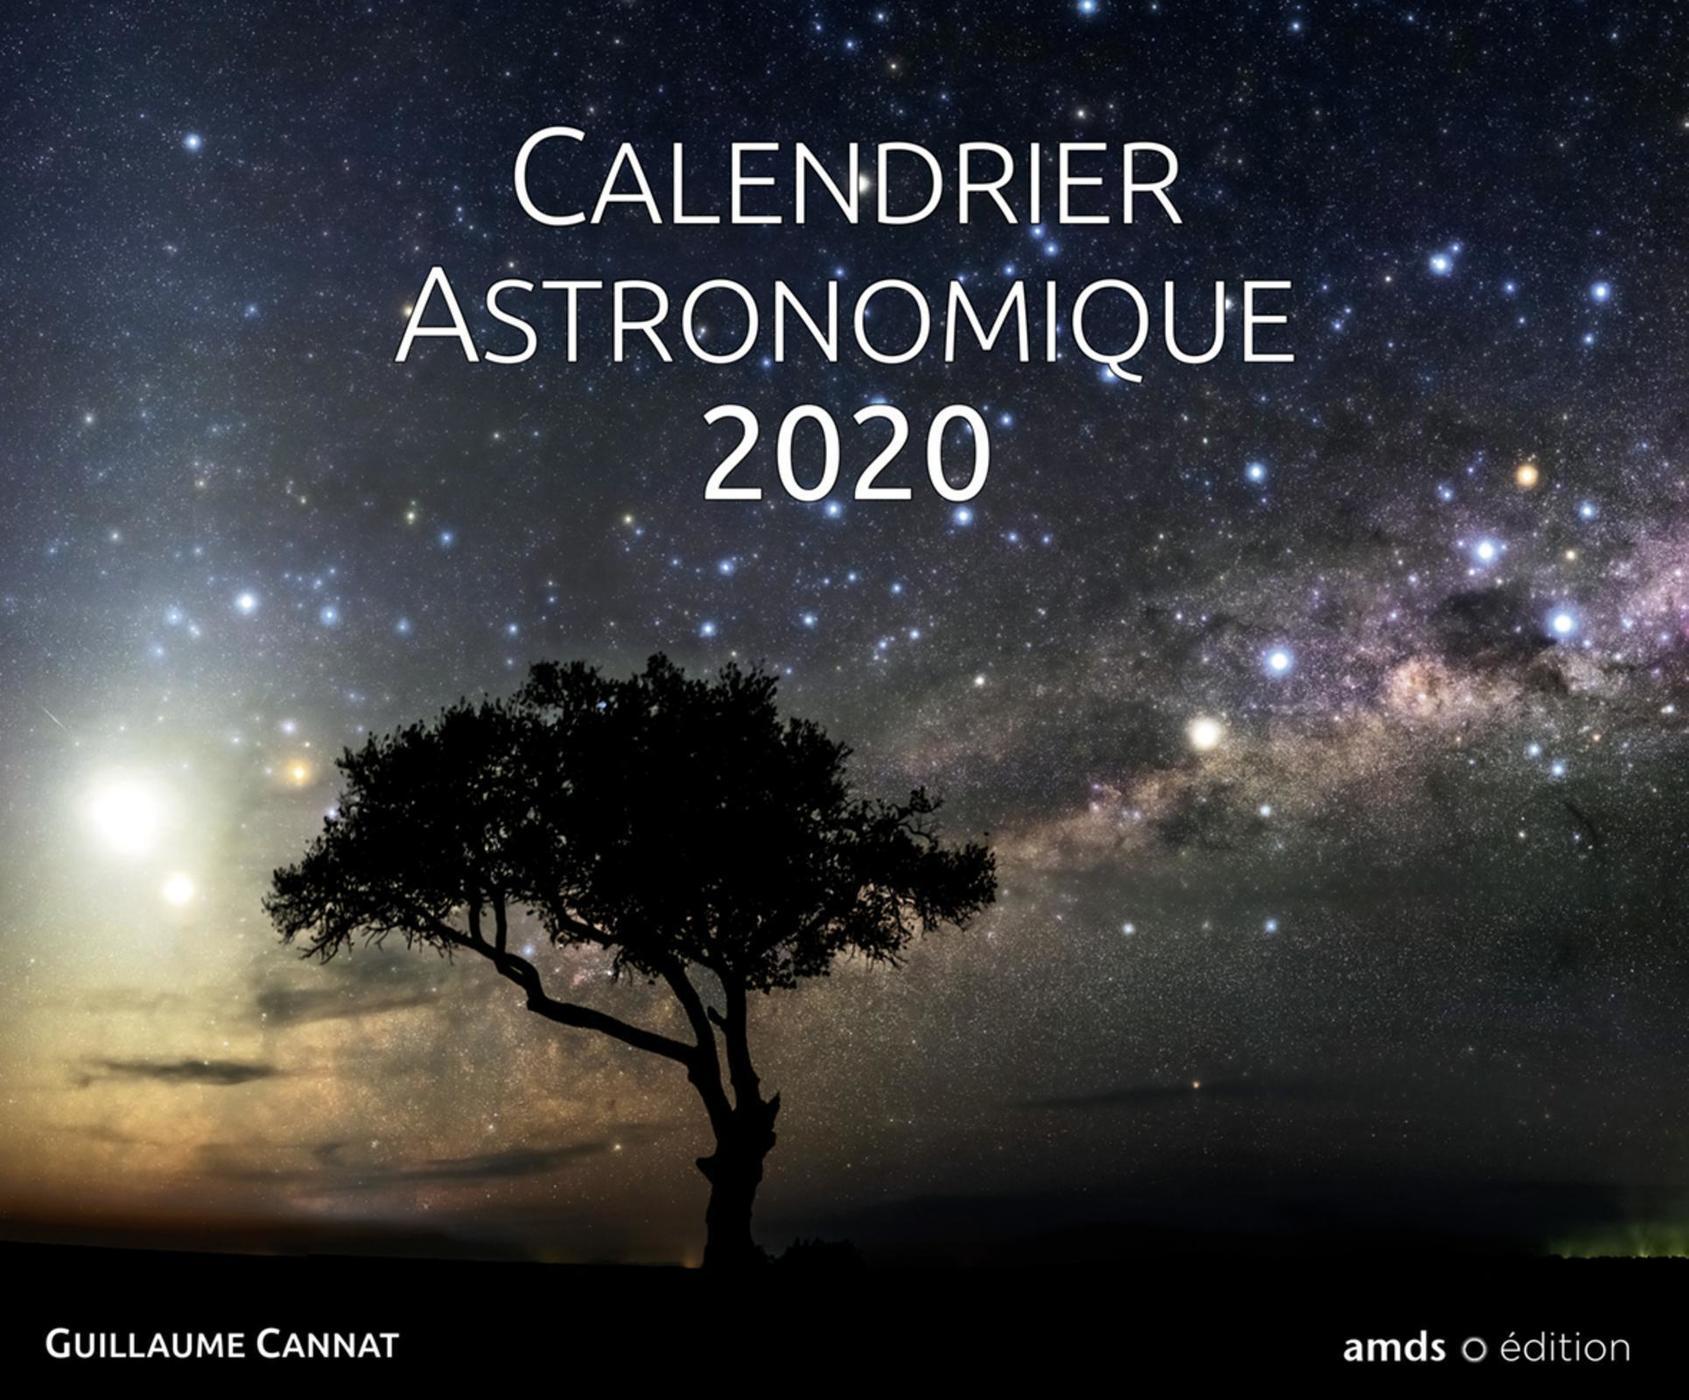 Calendrier Vae 2020.Calendrier Astronomique 2020 G Cannat 6eme Edition Librairie Eyrolles